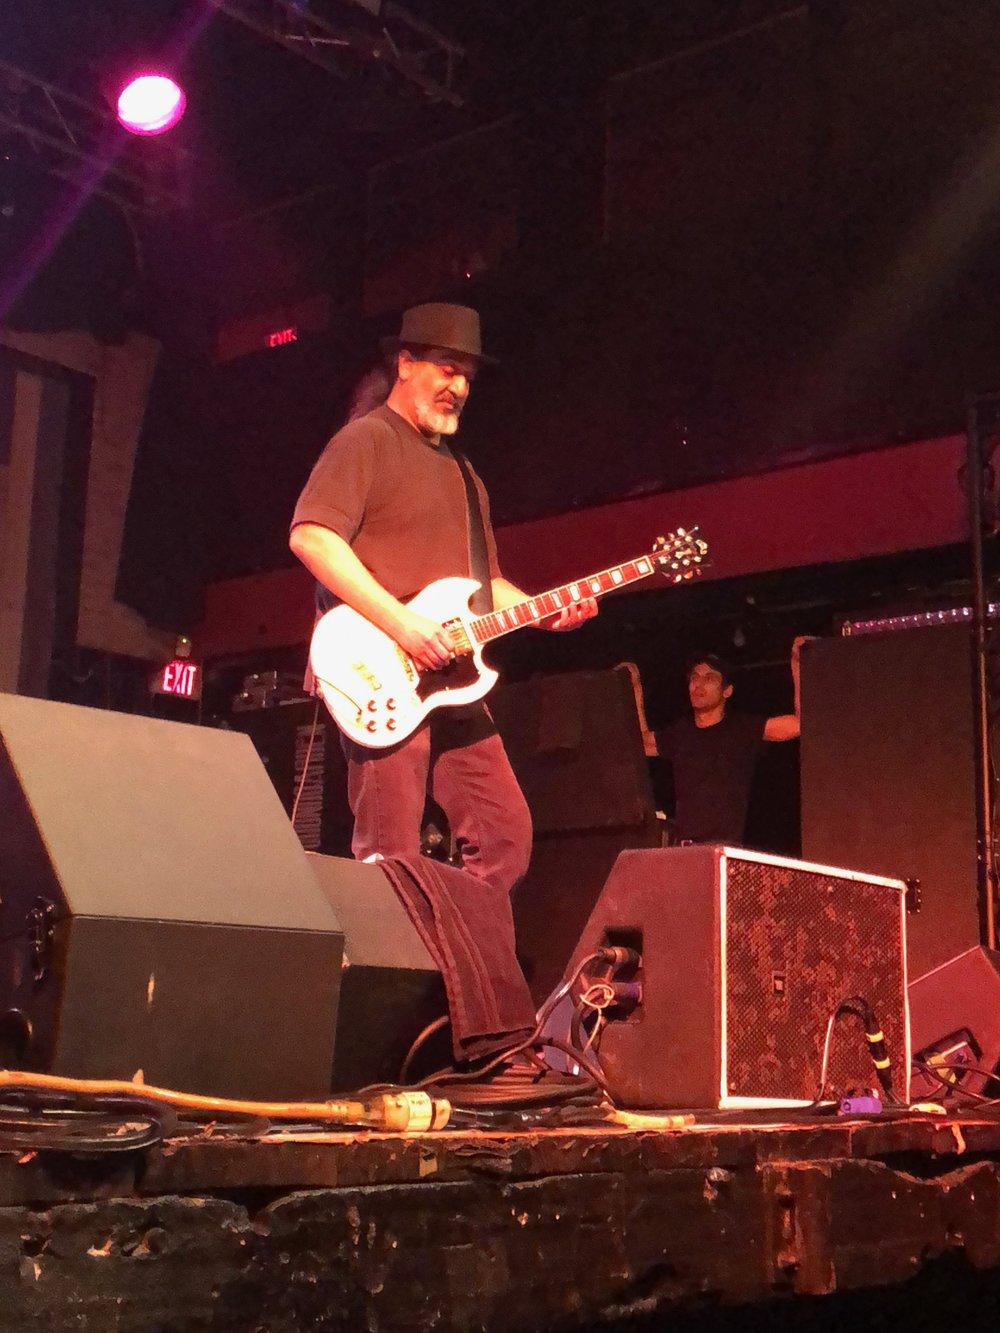 JeffgardenDotCom Kim Thayil MC50 FL - 40.jpg